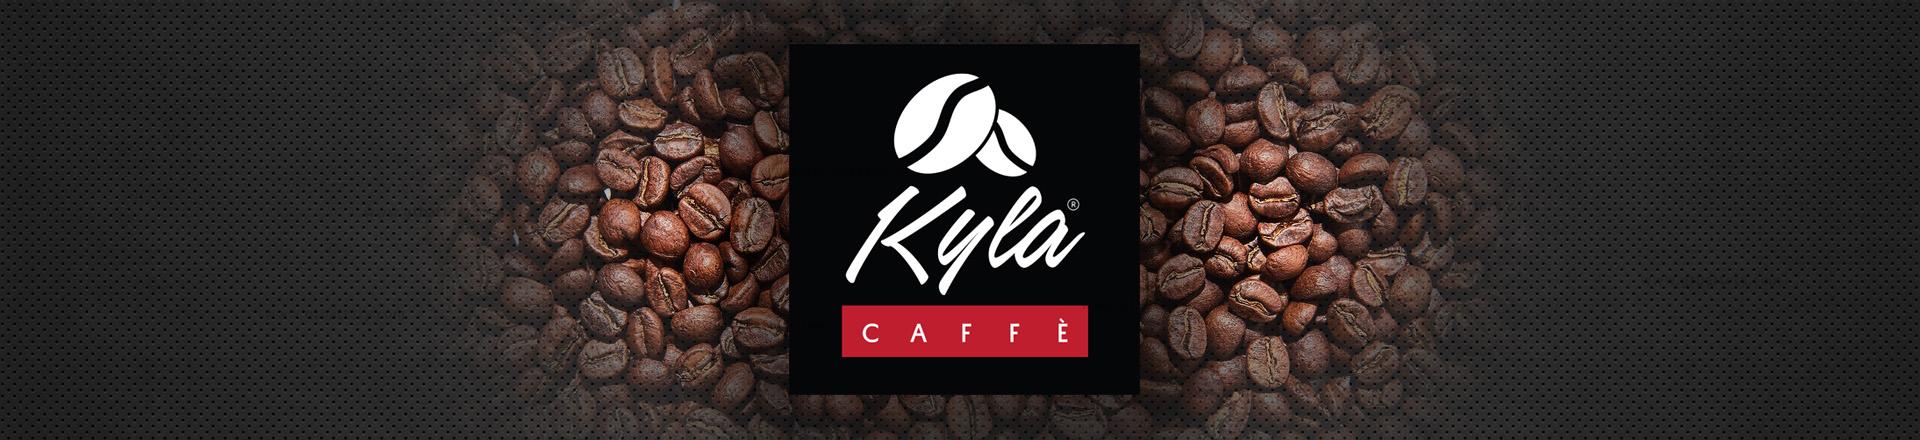 Distribuzione Kyla Caffé